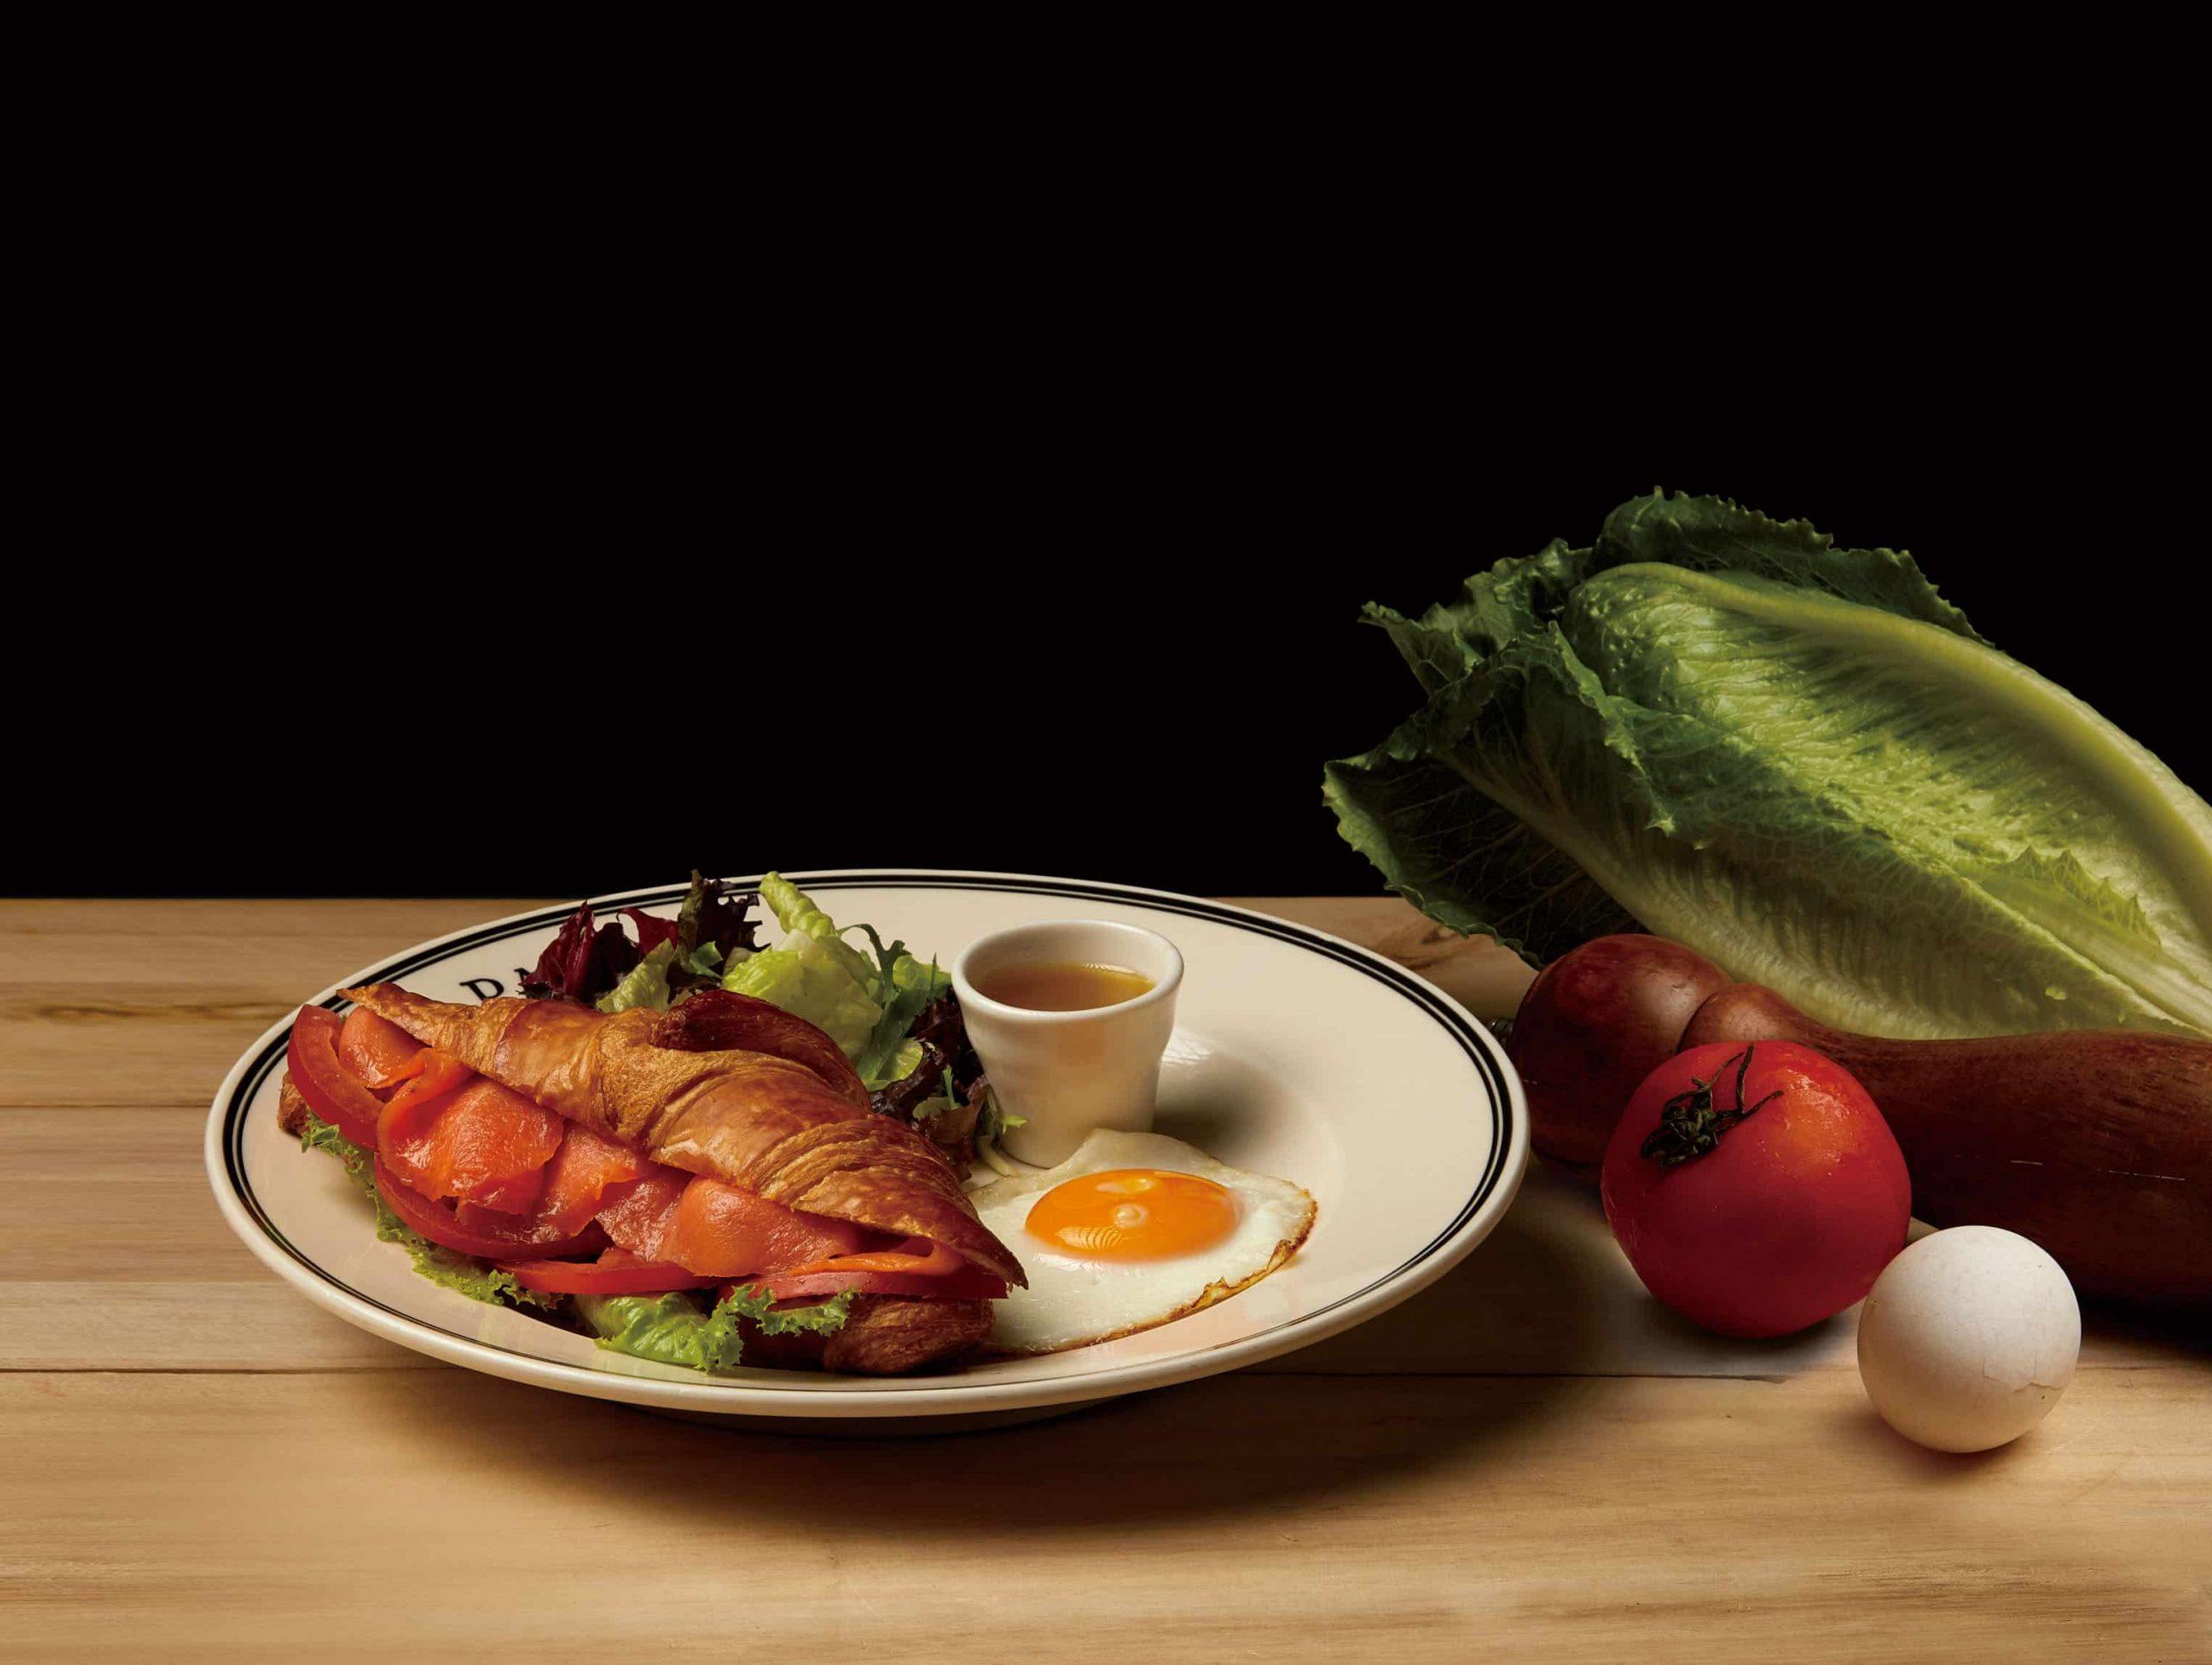 大西洋燻鮭瘋可頌 Croissant with Smoked Salmon